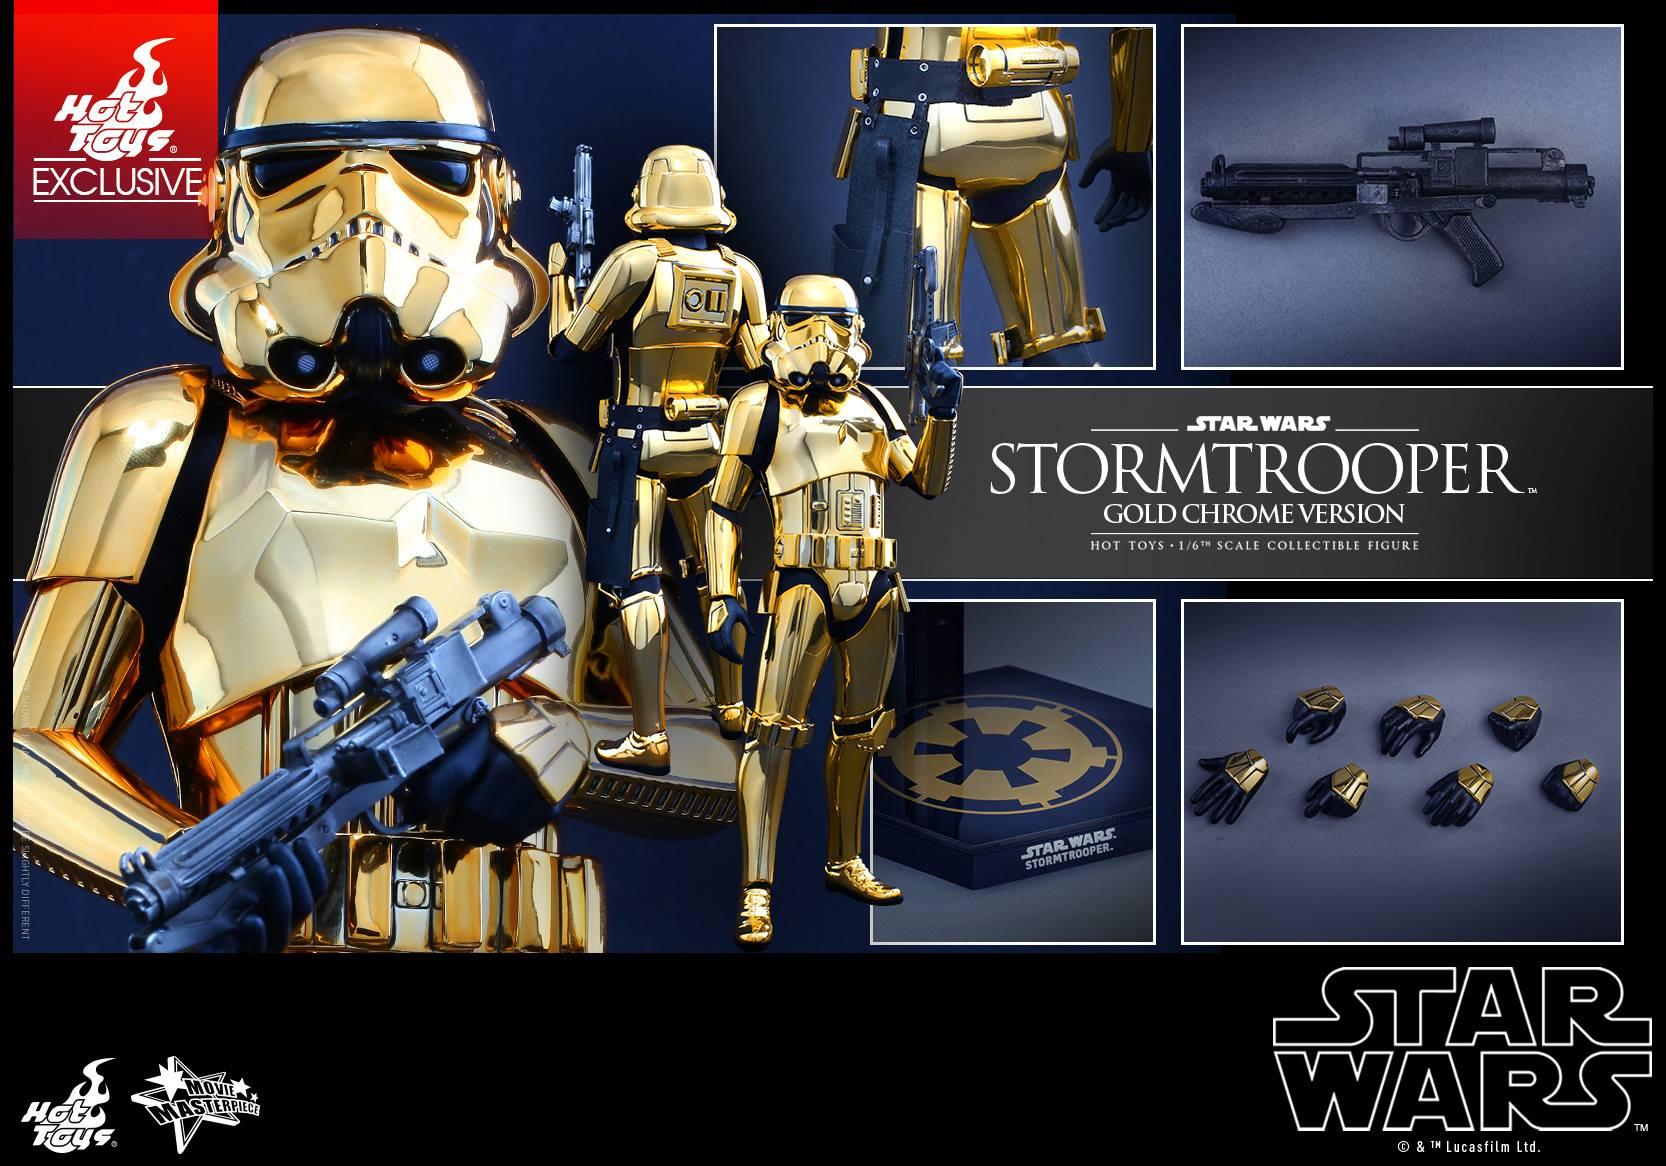 Hot Toys Gold Chrome Stormtrooper (1)